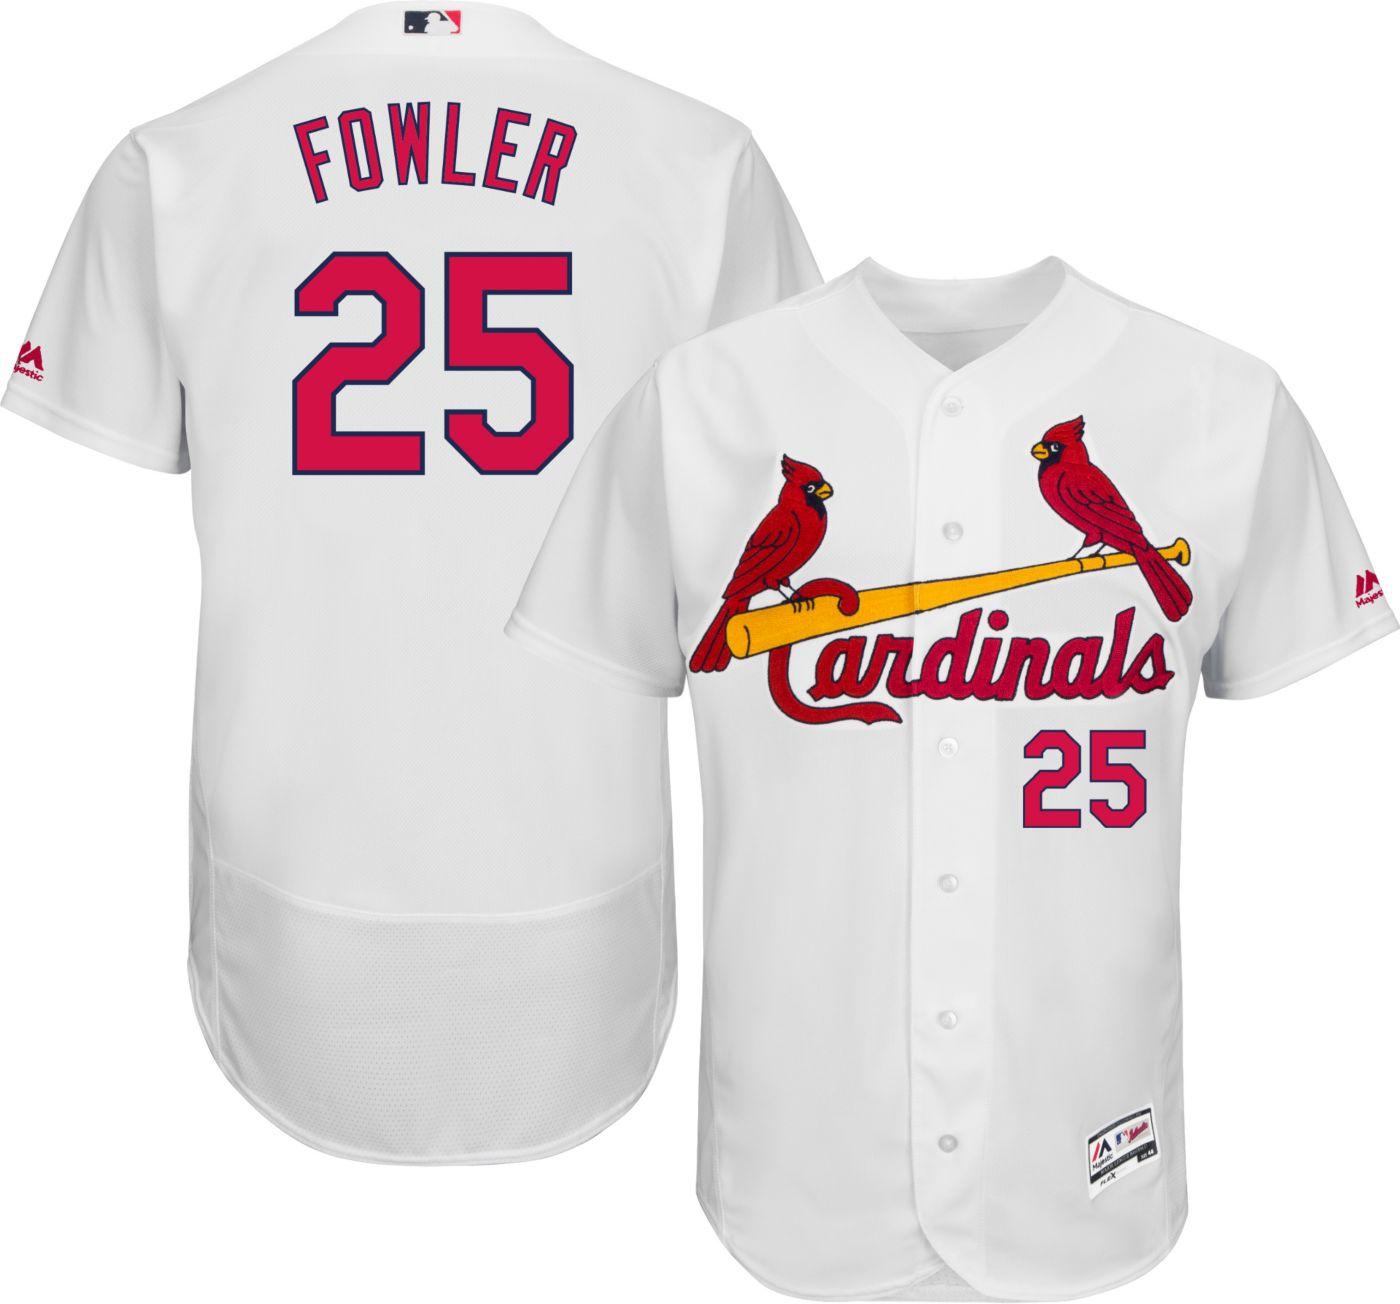 Majestic Men's Authentic St. Louis Cardinals Dexter Fowler #25 Flex Base Home White On-Field Jersey